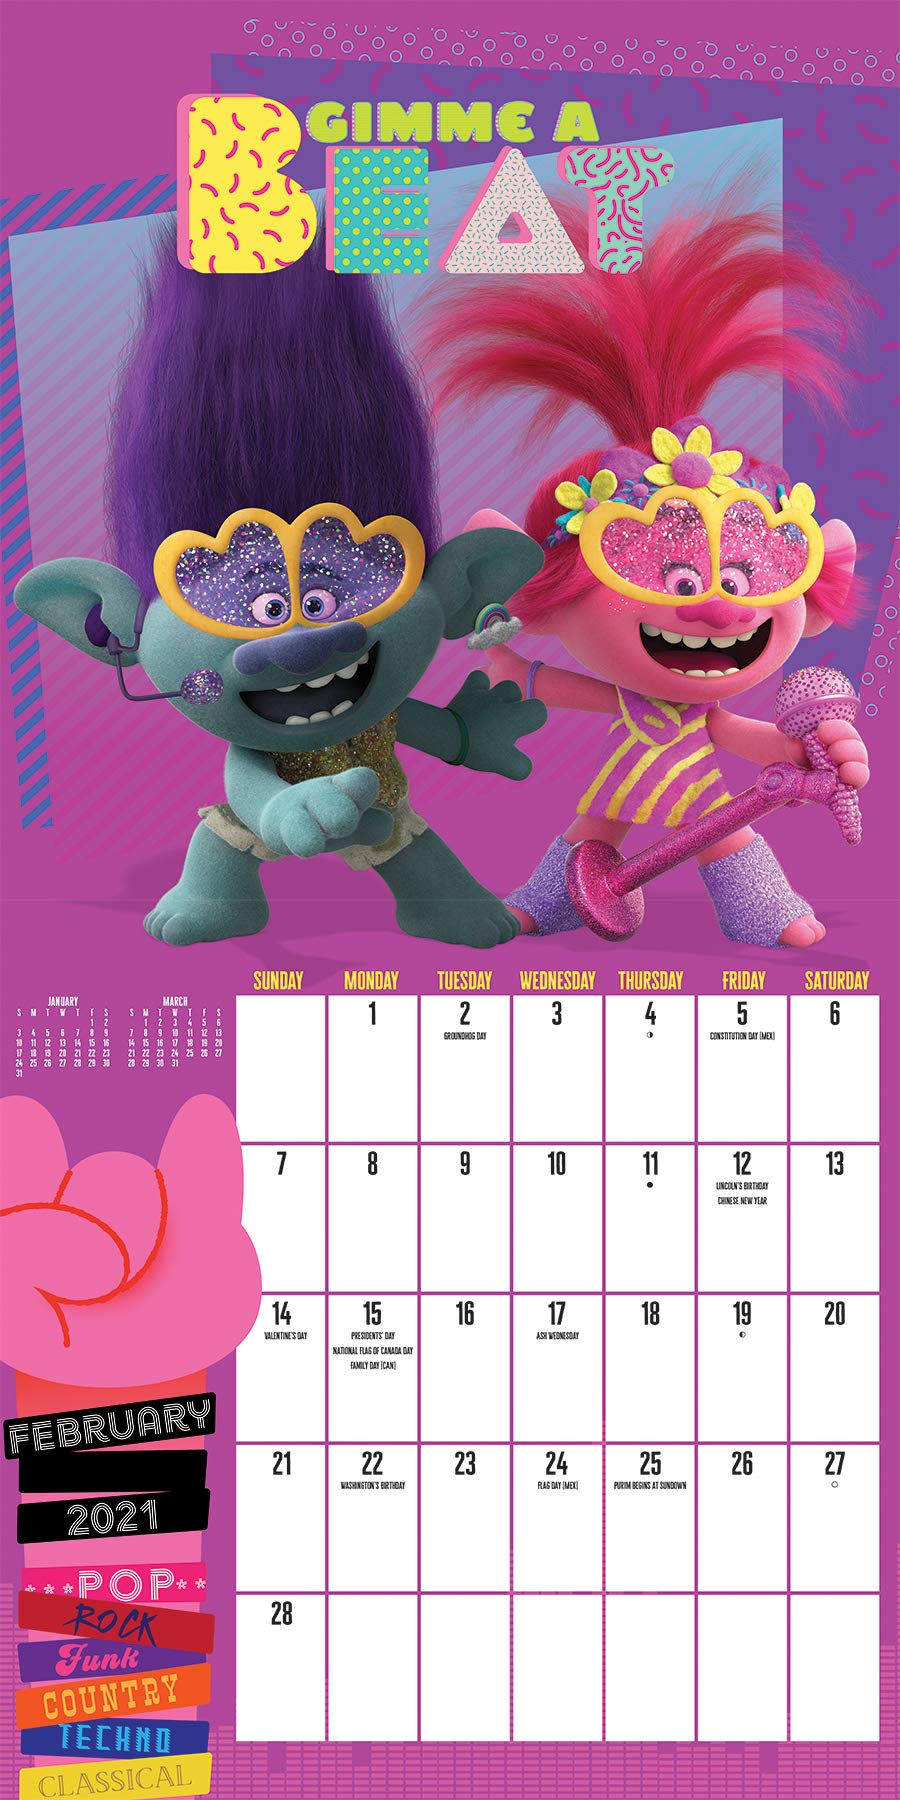 Trolls World Tour Calendar: Amazon.co.uk: Trends International LLC